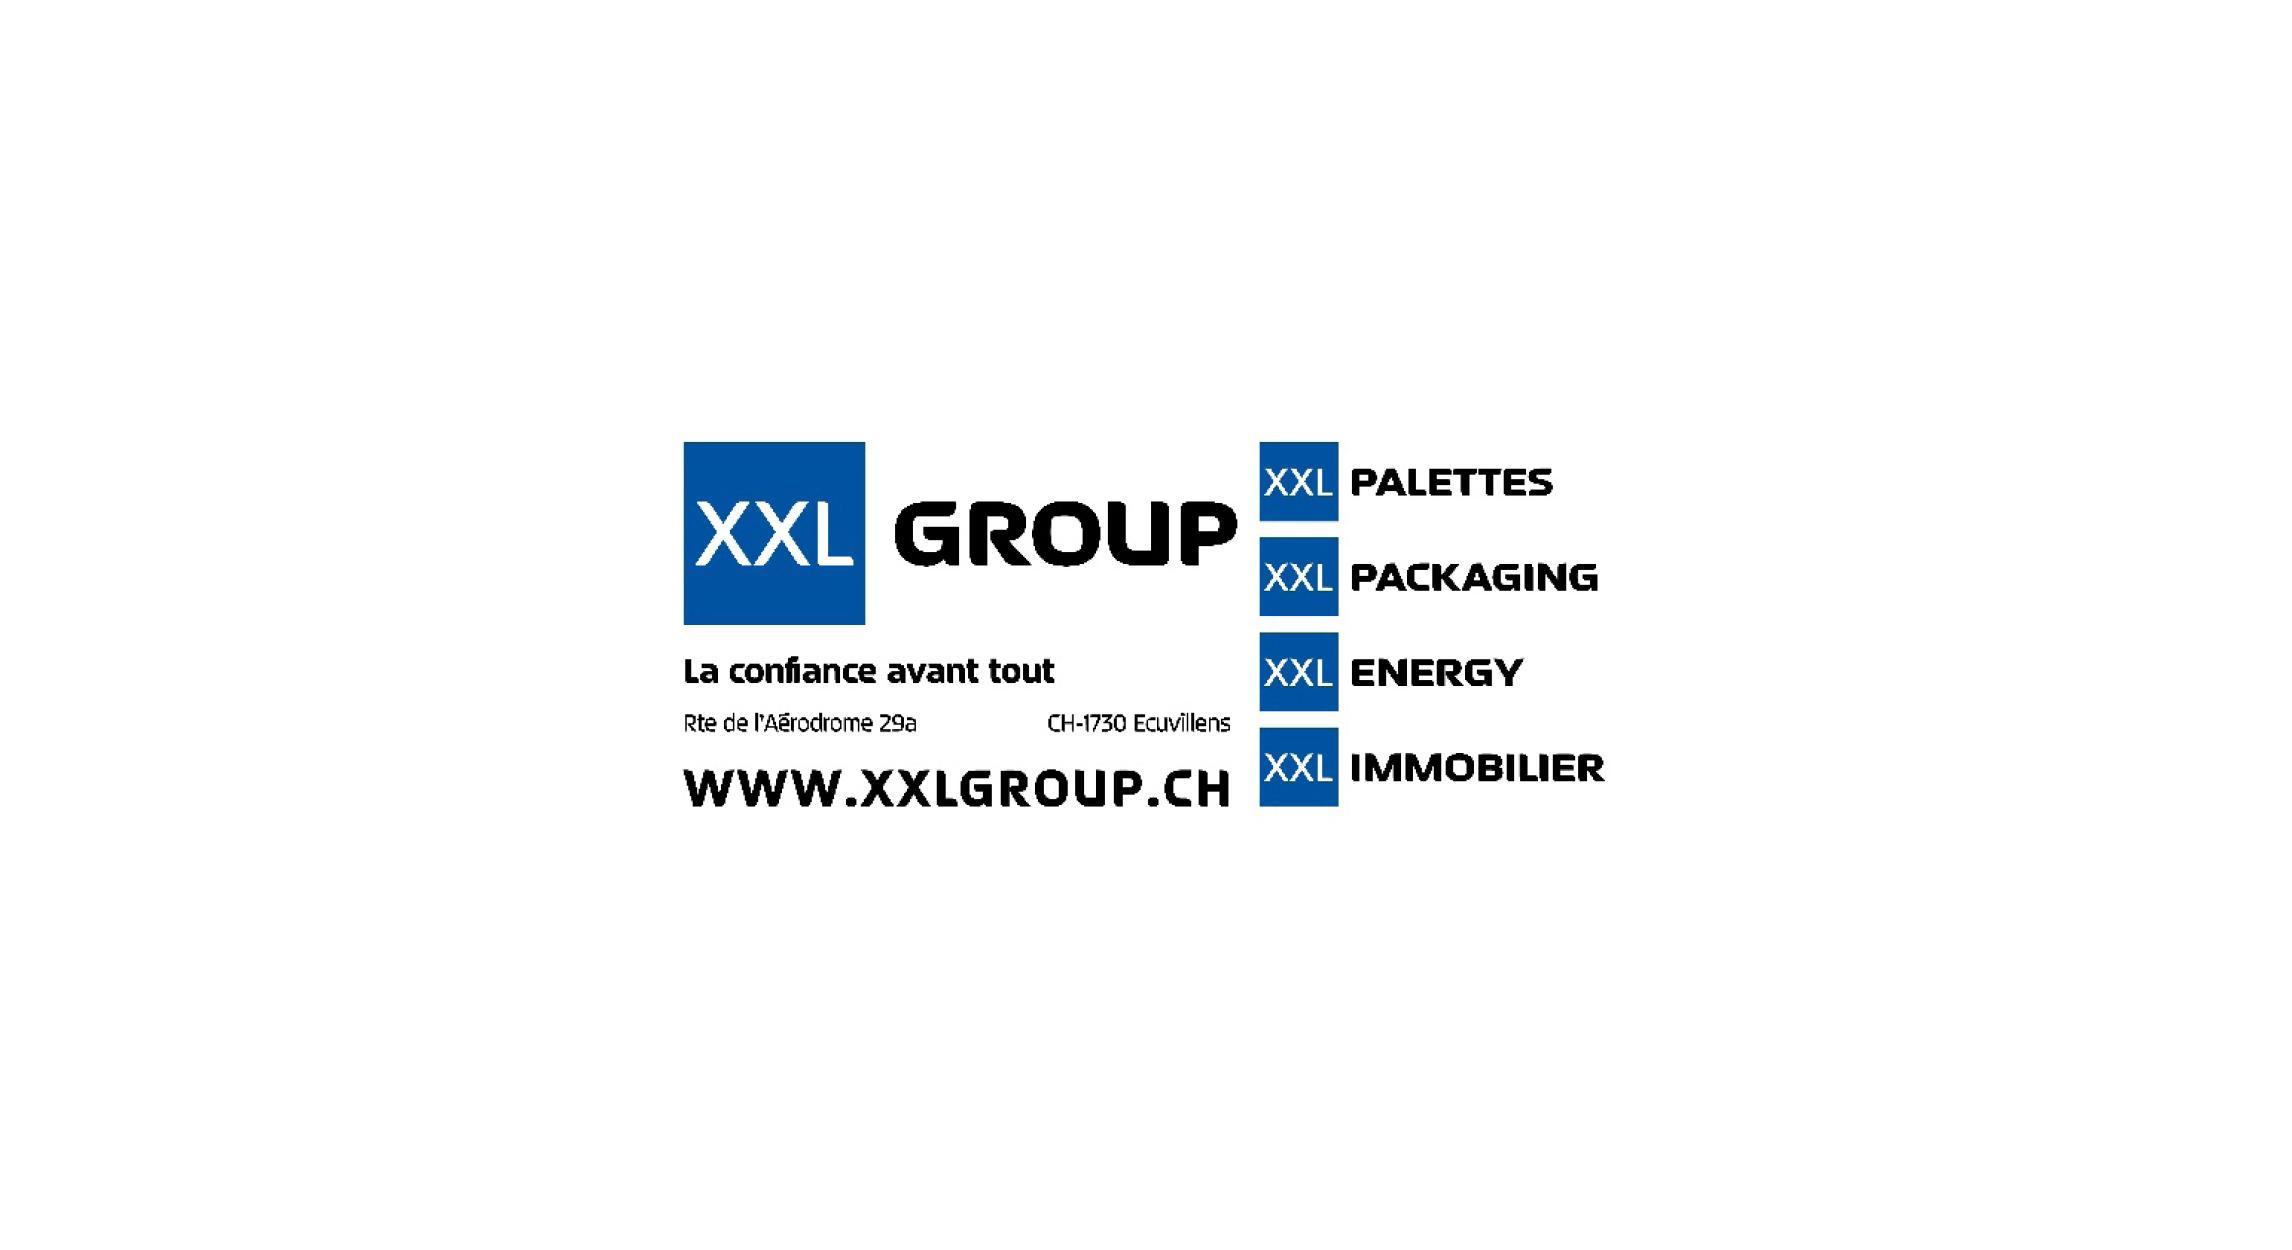 XXL Group